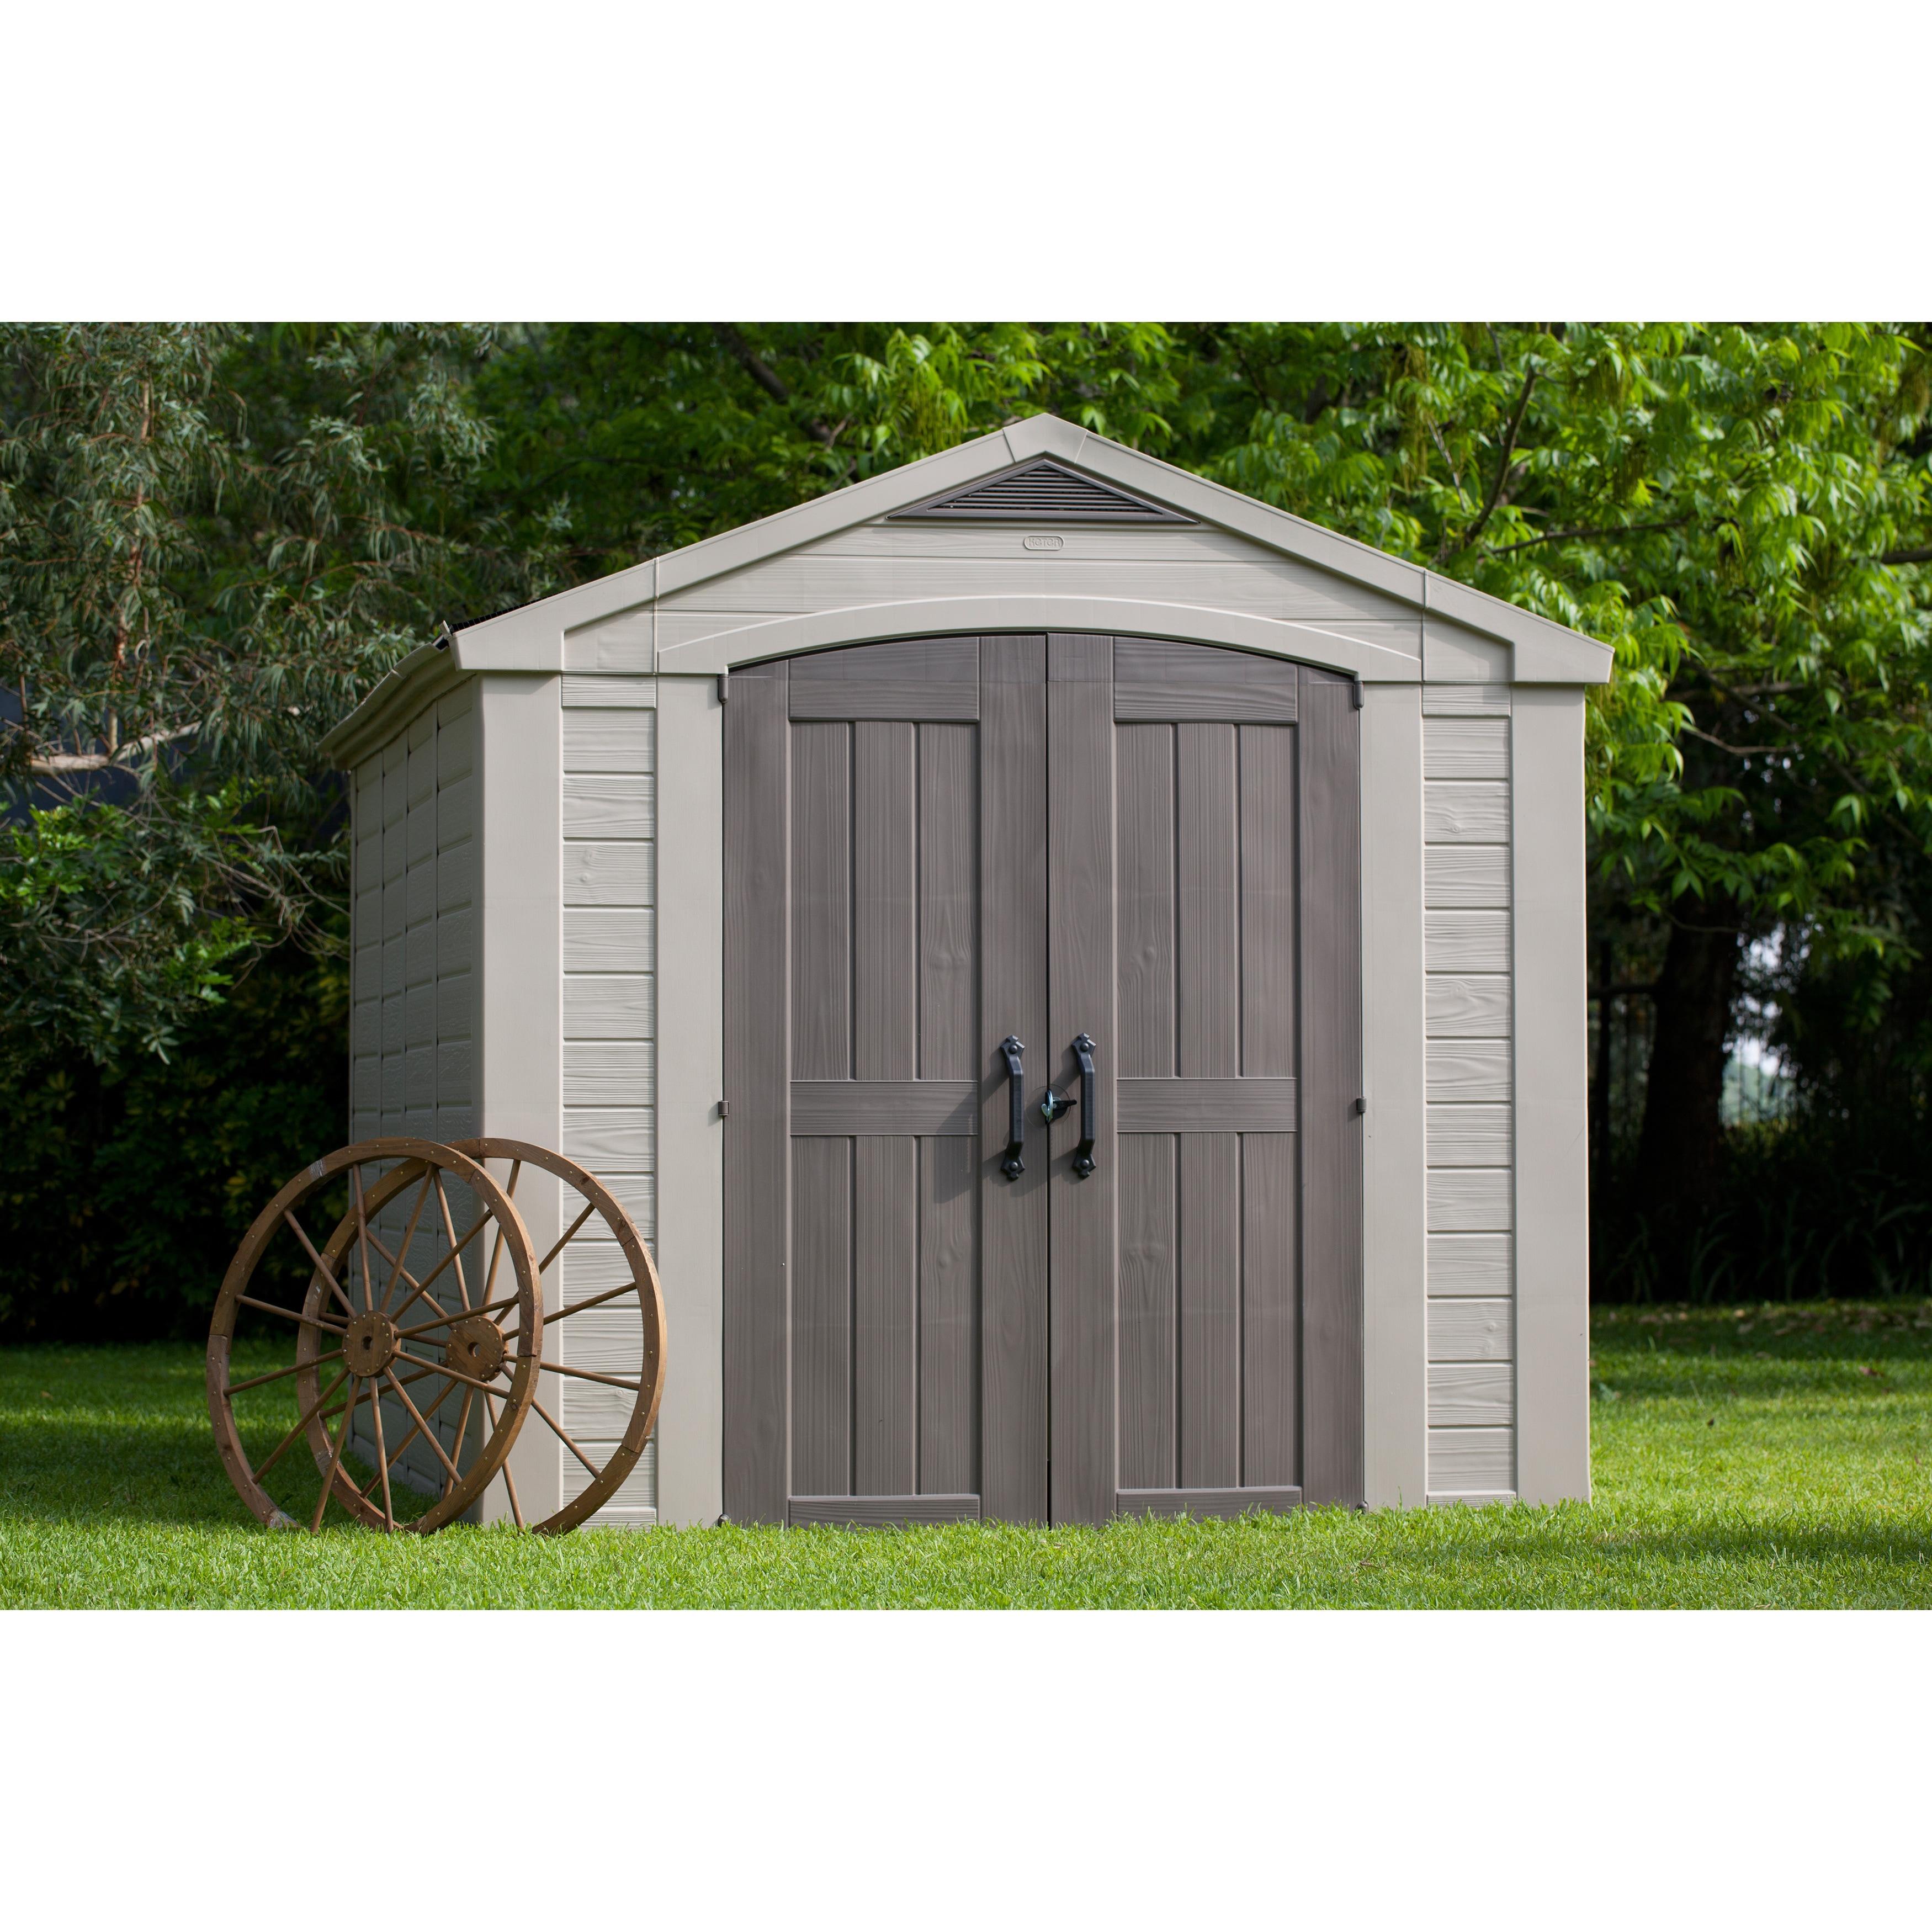 ft com x sheds walmart ip storage shed lifetime